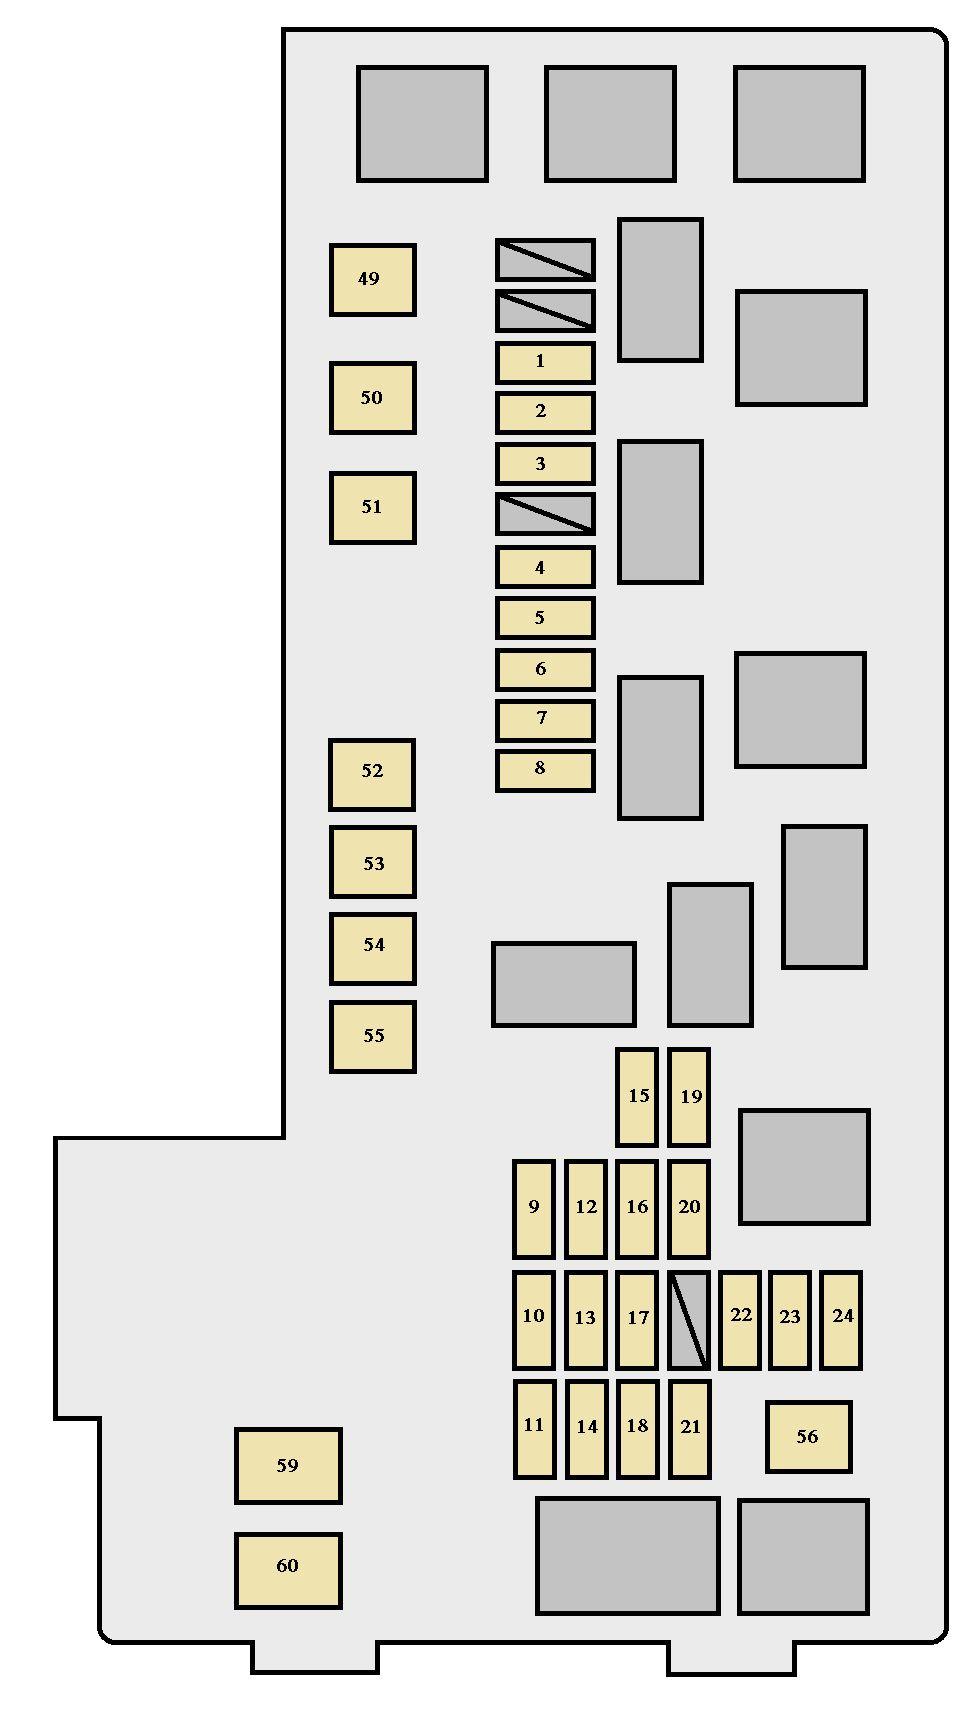 [DIAGRAM_5LK]  MX_5691] Fuse Box Location Furthermore 2003 Toyota Highlander Fuse Box  Diagram Free Diagram | 2006 Highlander Hybrid Fuse Box Location |  | Wida Weasi Iosco Gue45 Mohammedshrine Librar Wiring 101